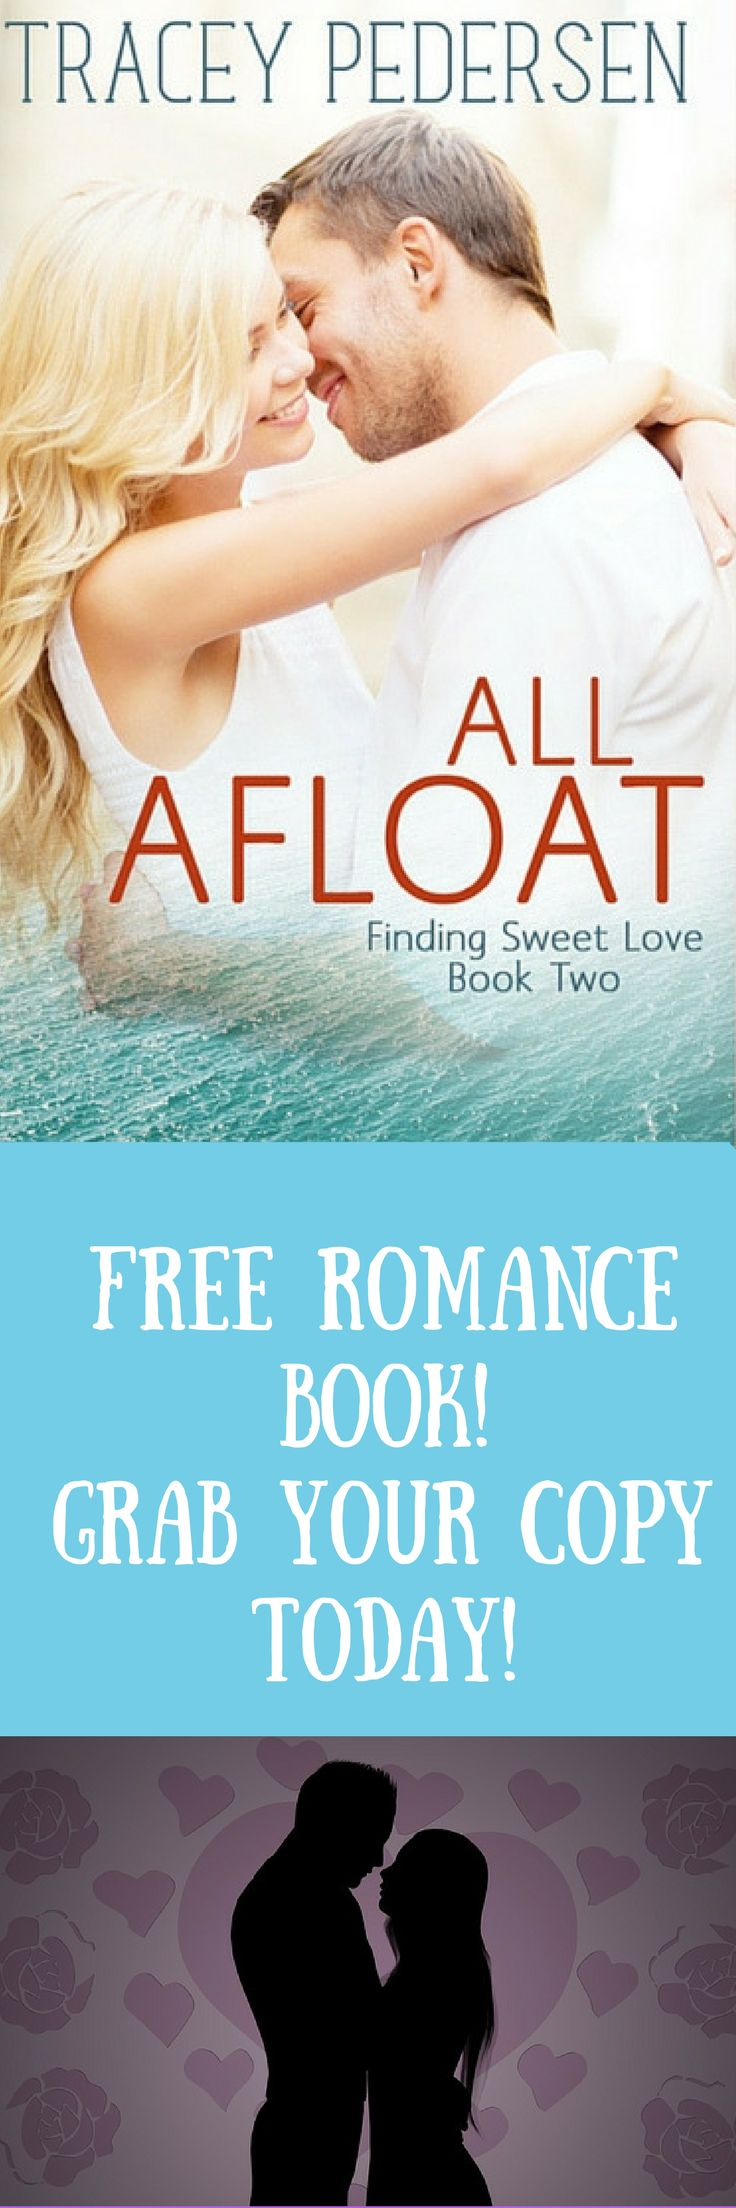 Free Books, Free Kindle Books, Romance Books, Free Romance Books, Sweet  Romance